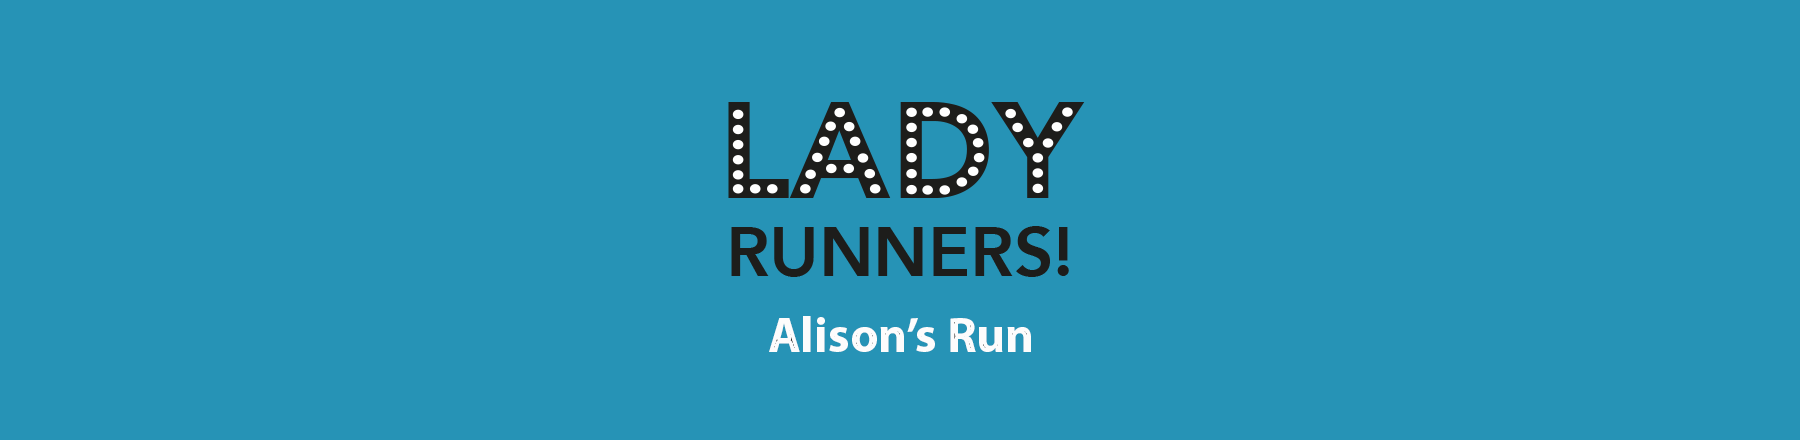 Benhall Park, On the corner of Robert Burns Ave & Bibury Road - Alison's Run - Wednesday